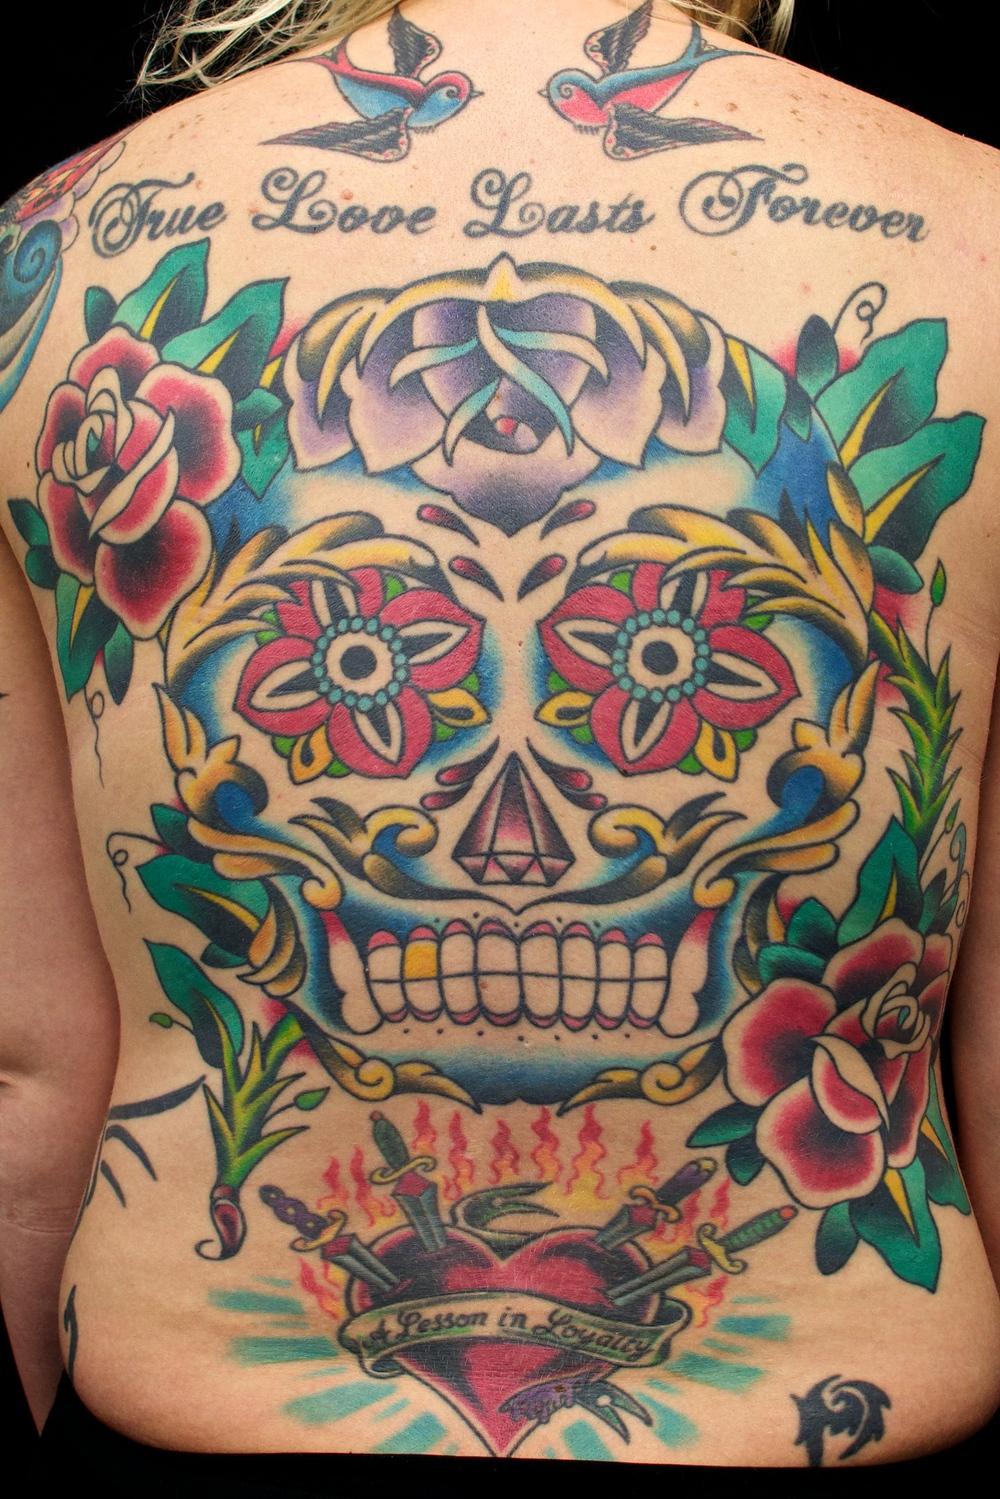 01042012 tattoos 05 17.jpg